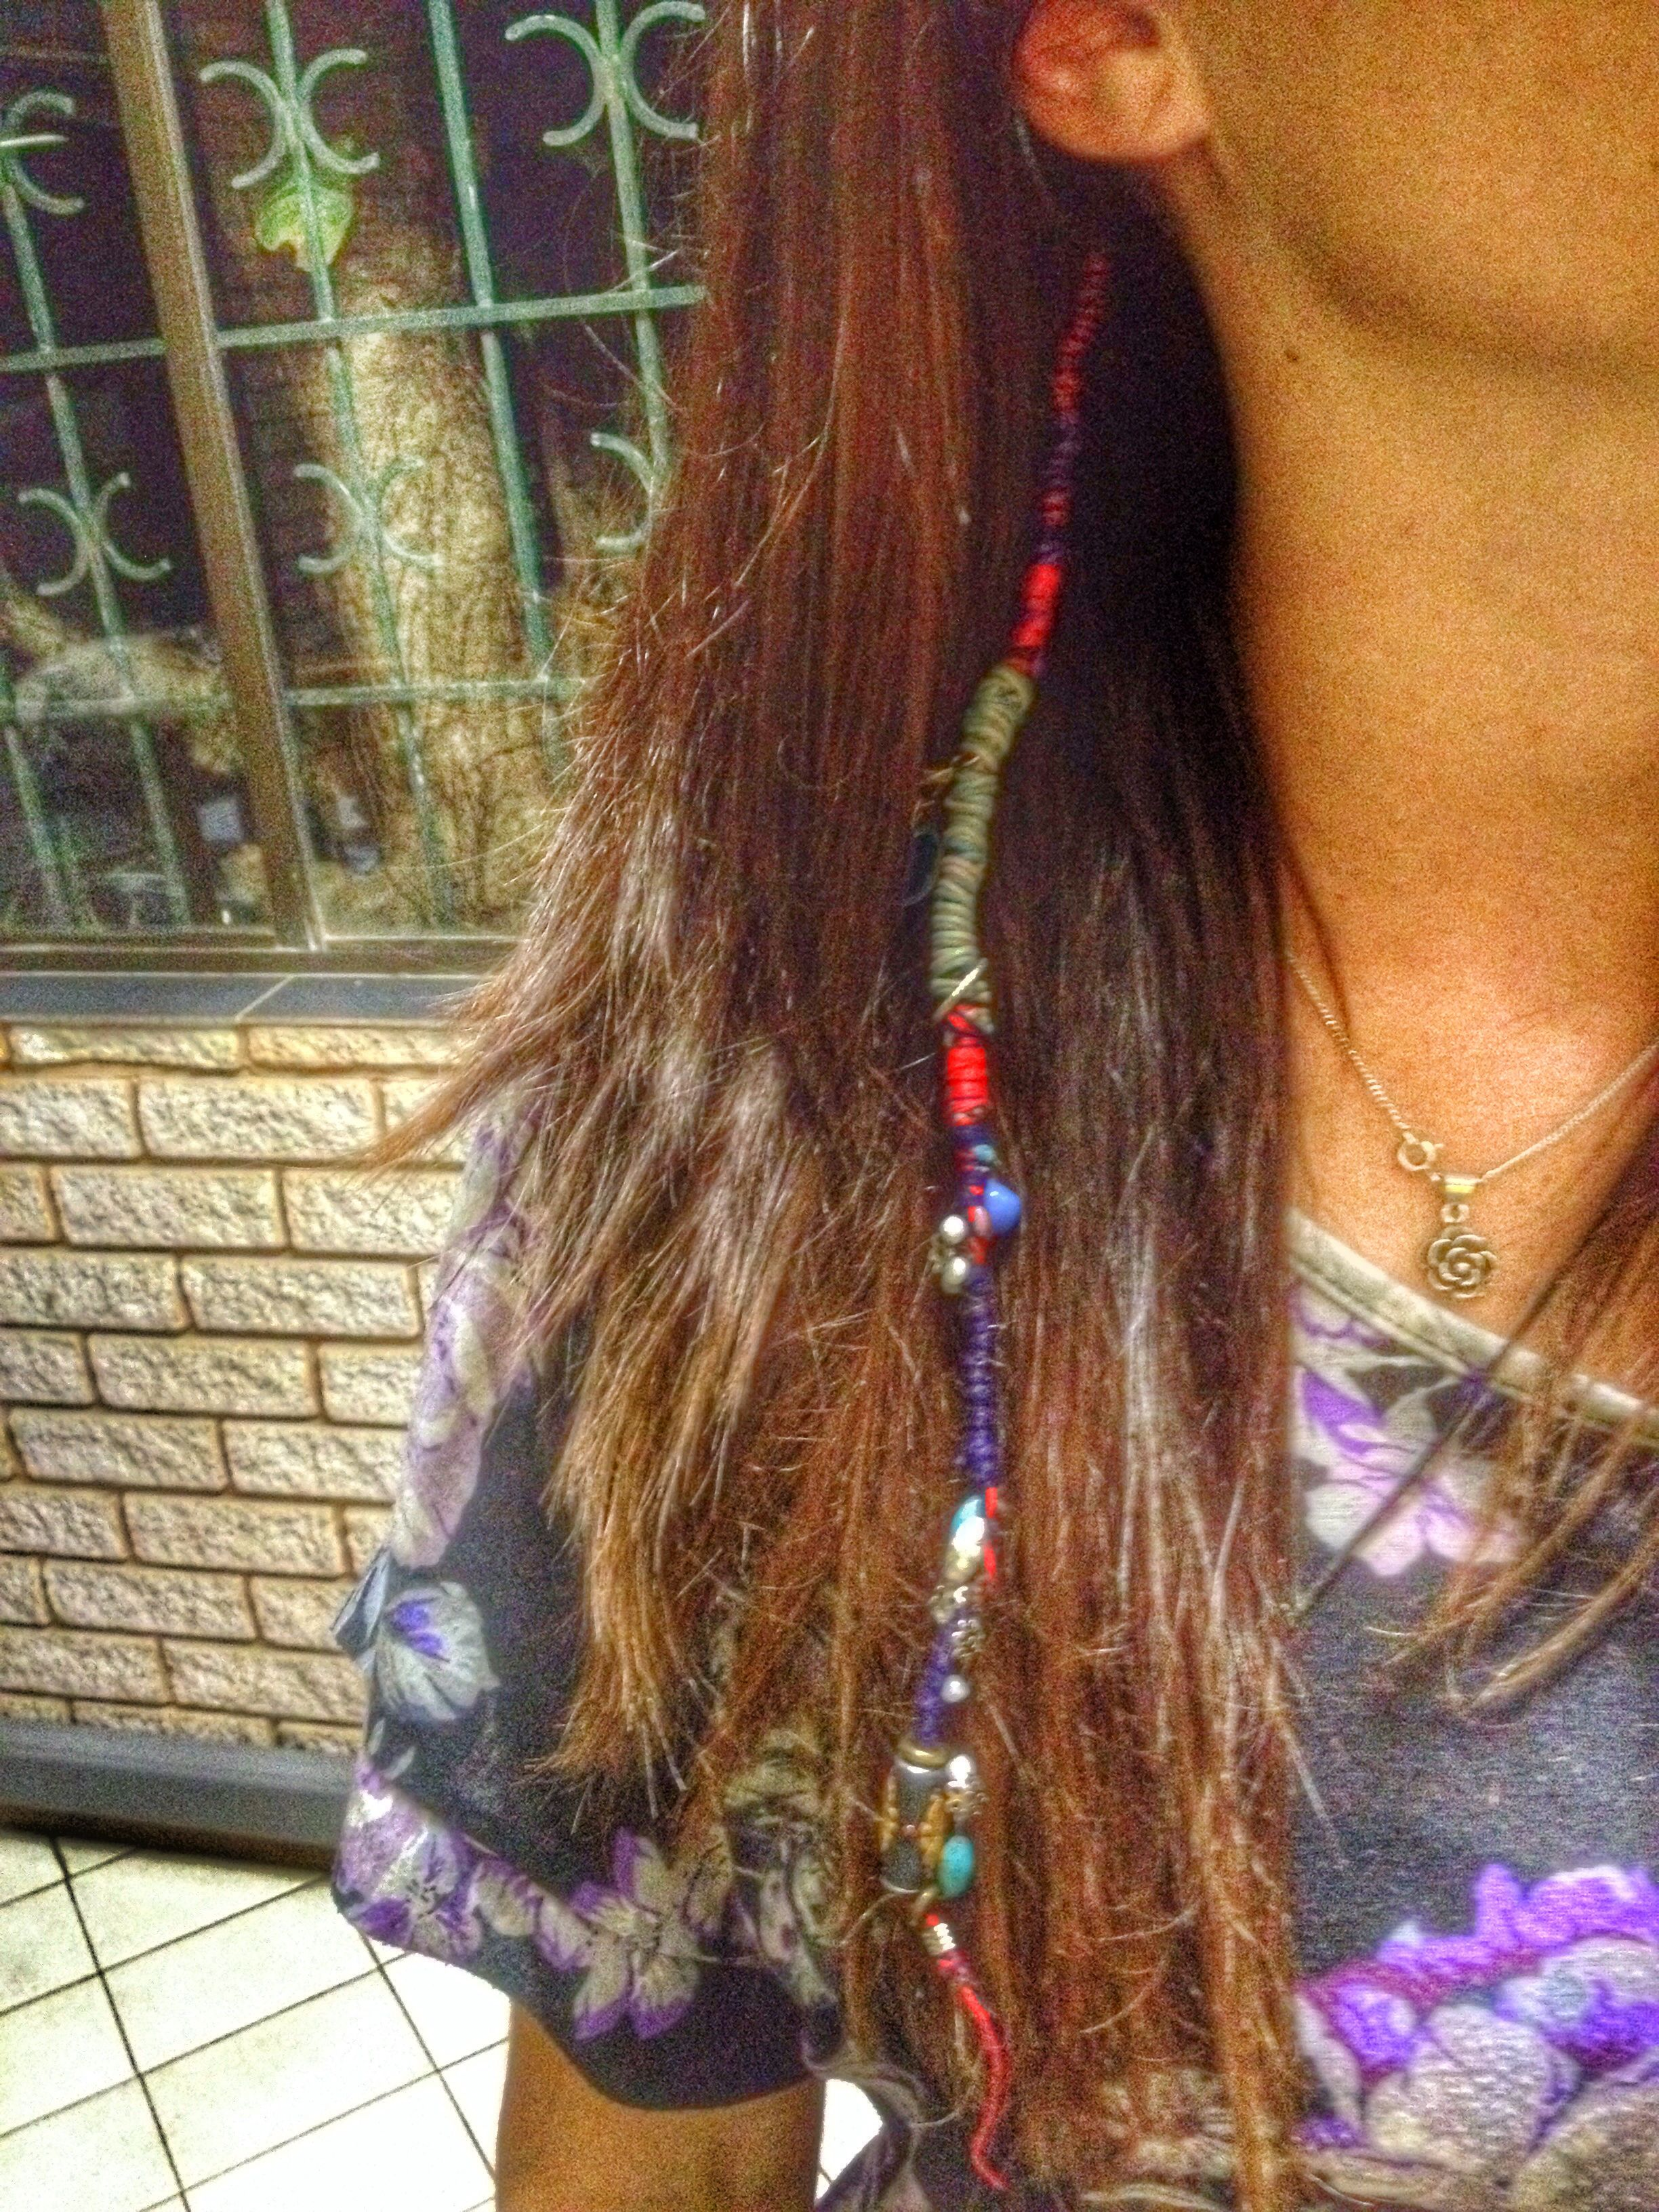 Hair Wrap Thread Diy Hair Wrap Beads Hippy Boho Hair Ideas Braid Hair Wrap Diy Diy Hairstyles Hair Wrap